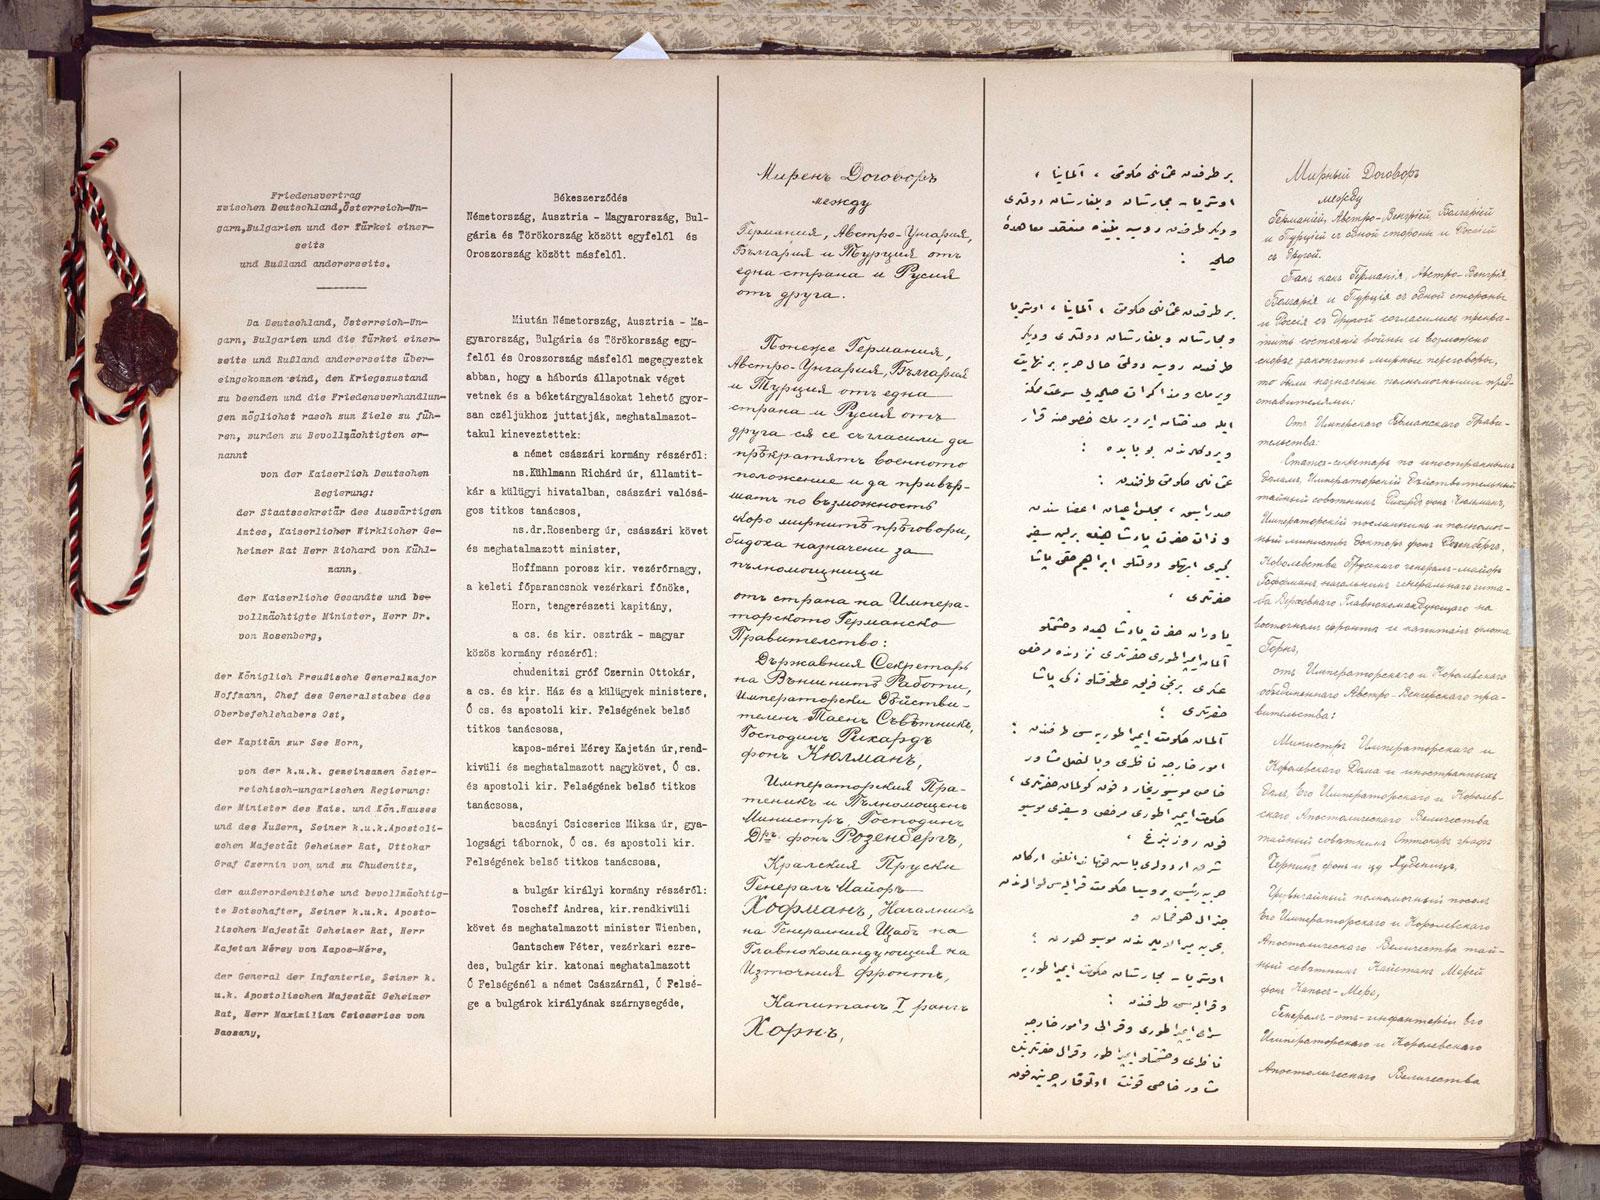 Traktat_brzeski_1918